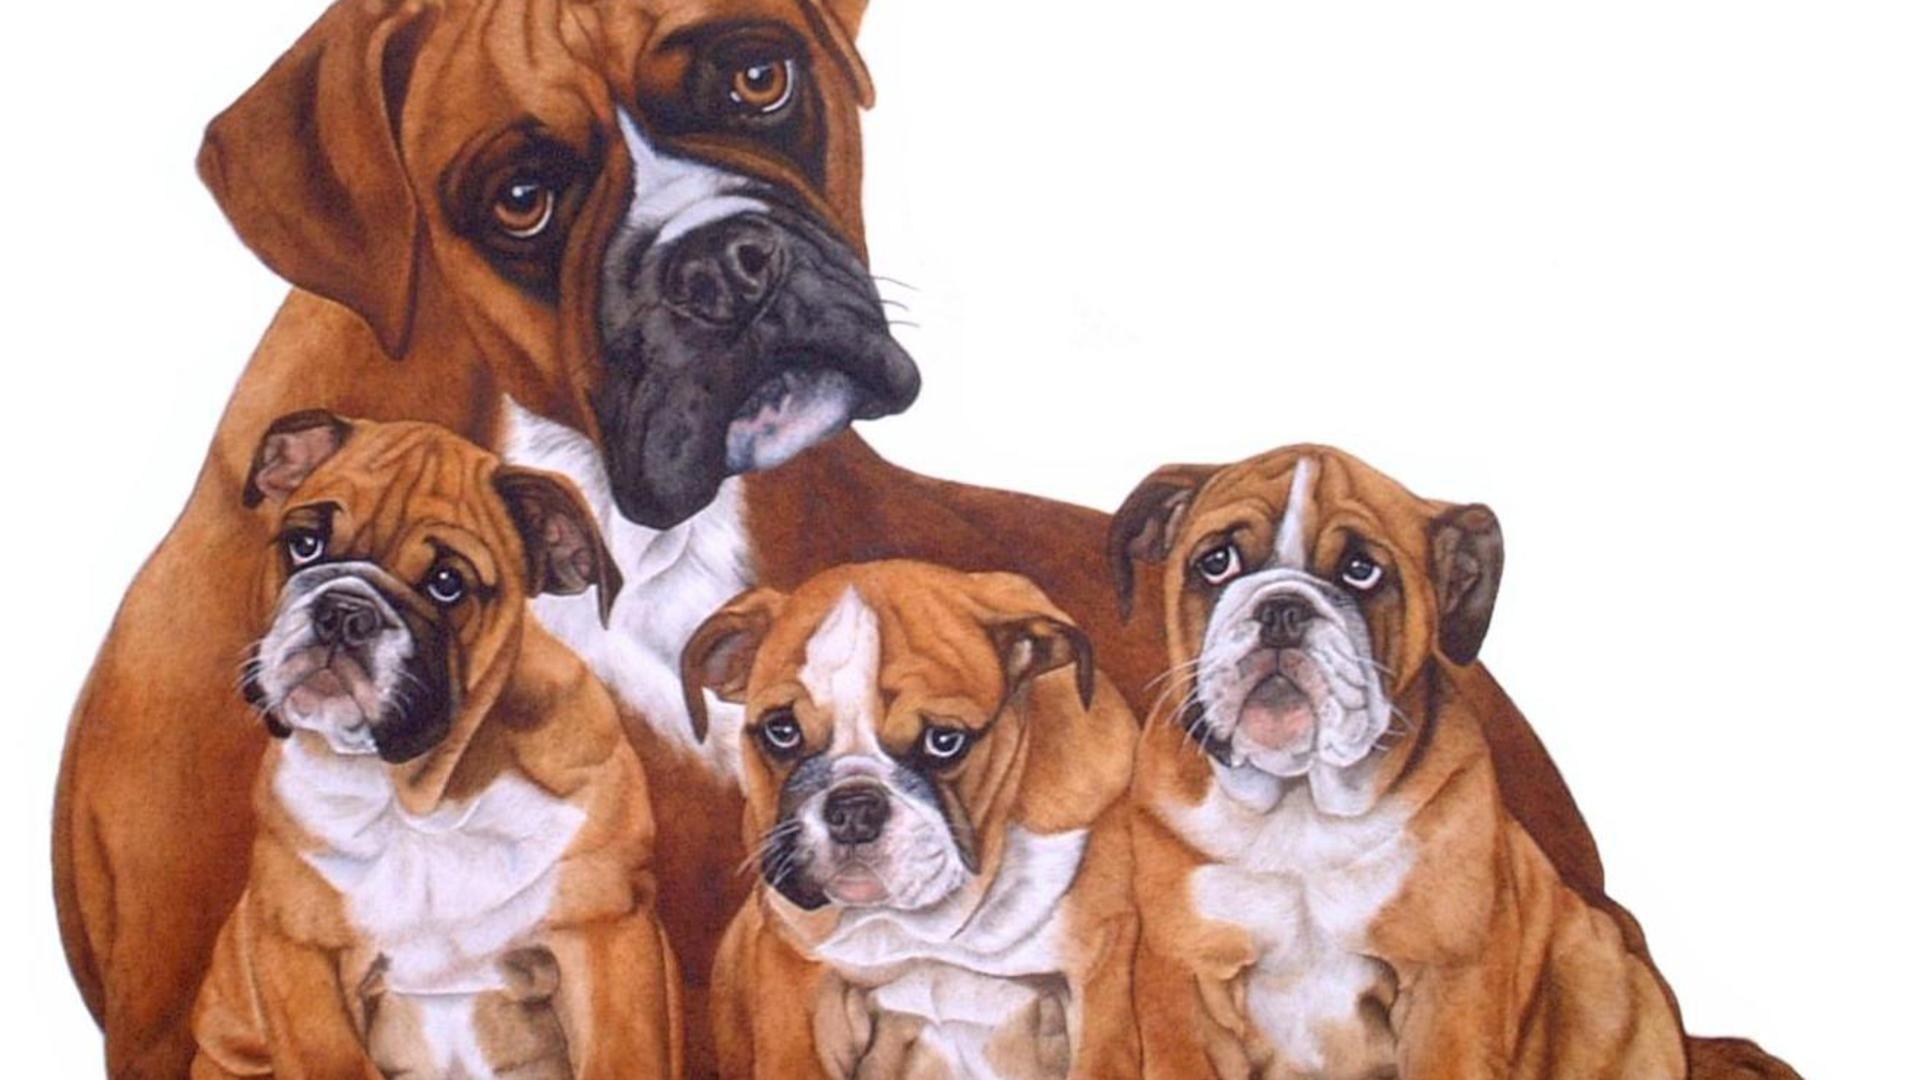 Pin By Deborah Babb On Dog Family Cross Paintings Dog Wallpaper Puppy Wallpaper